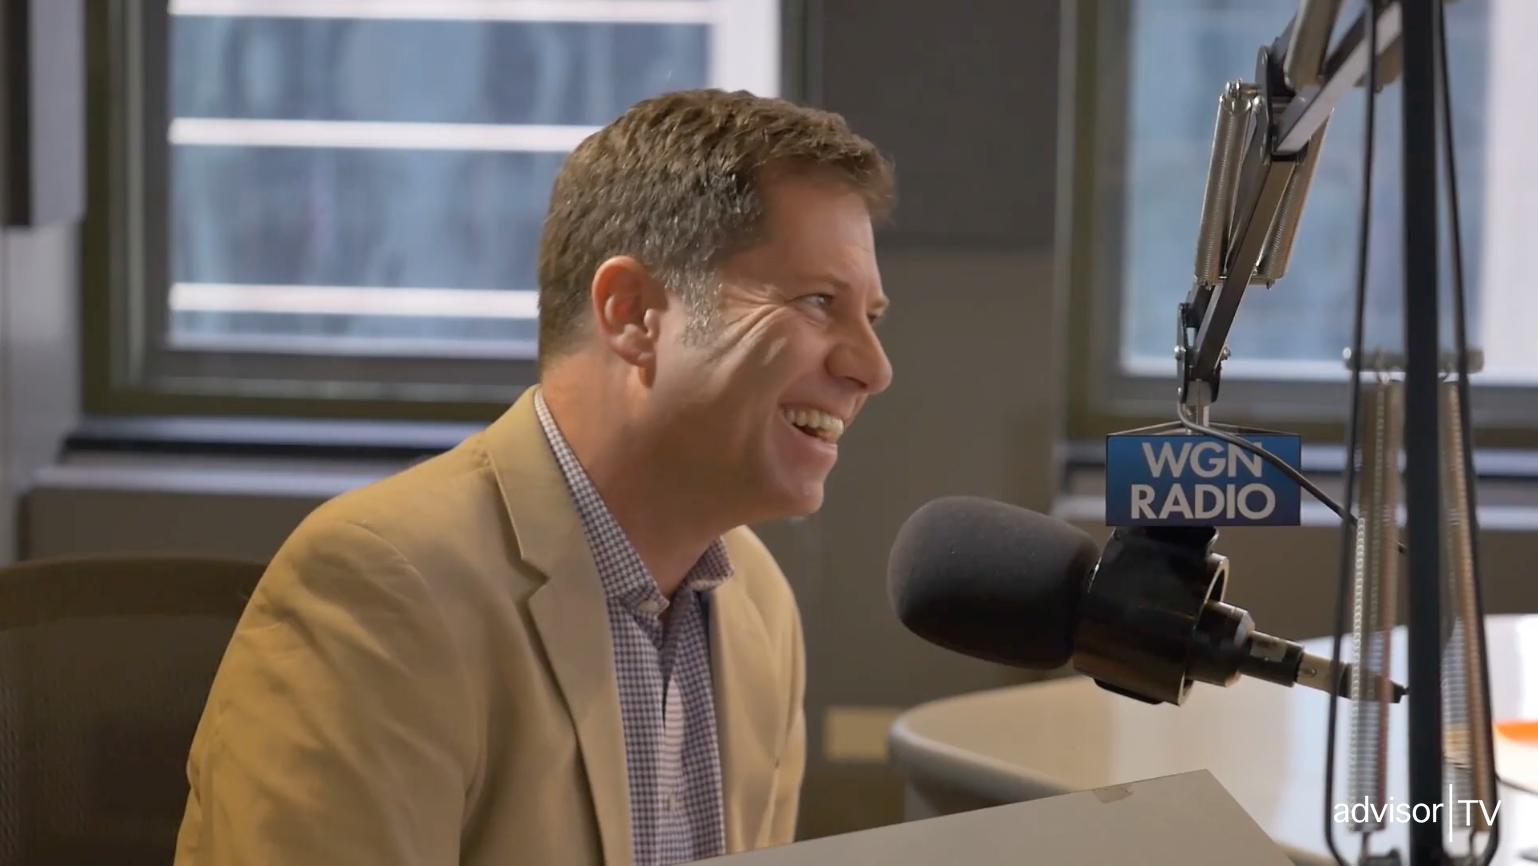 Making Waves on WGN Radio's Technori LIVE